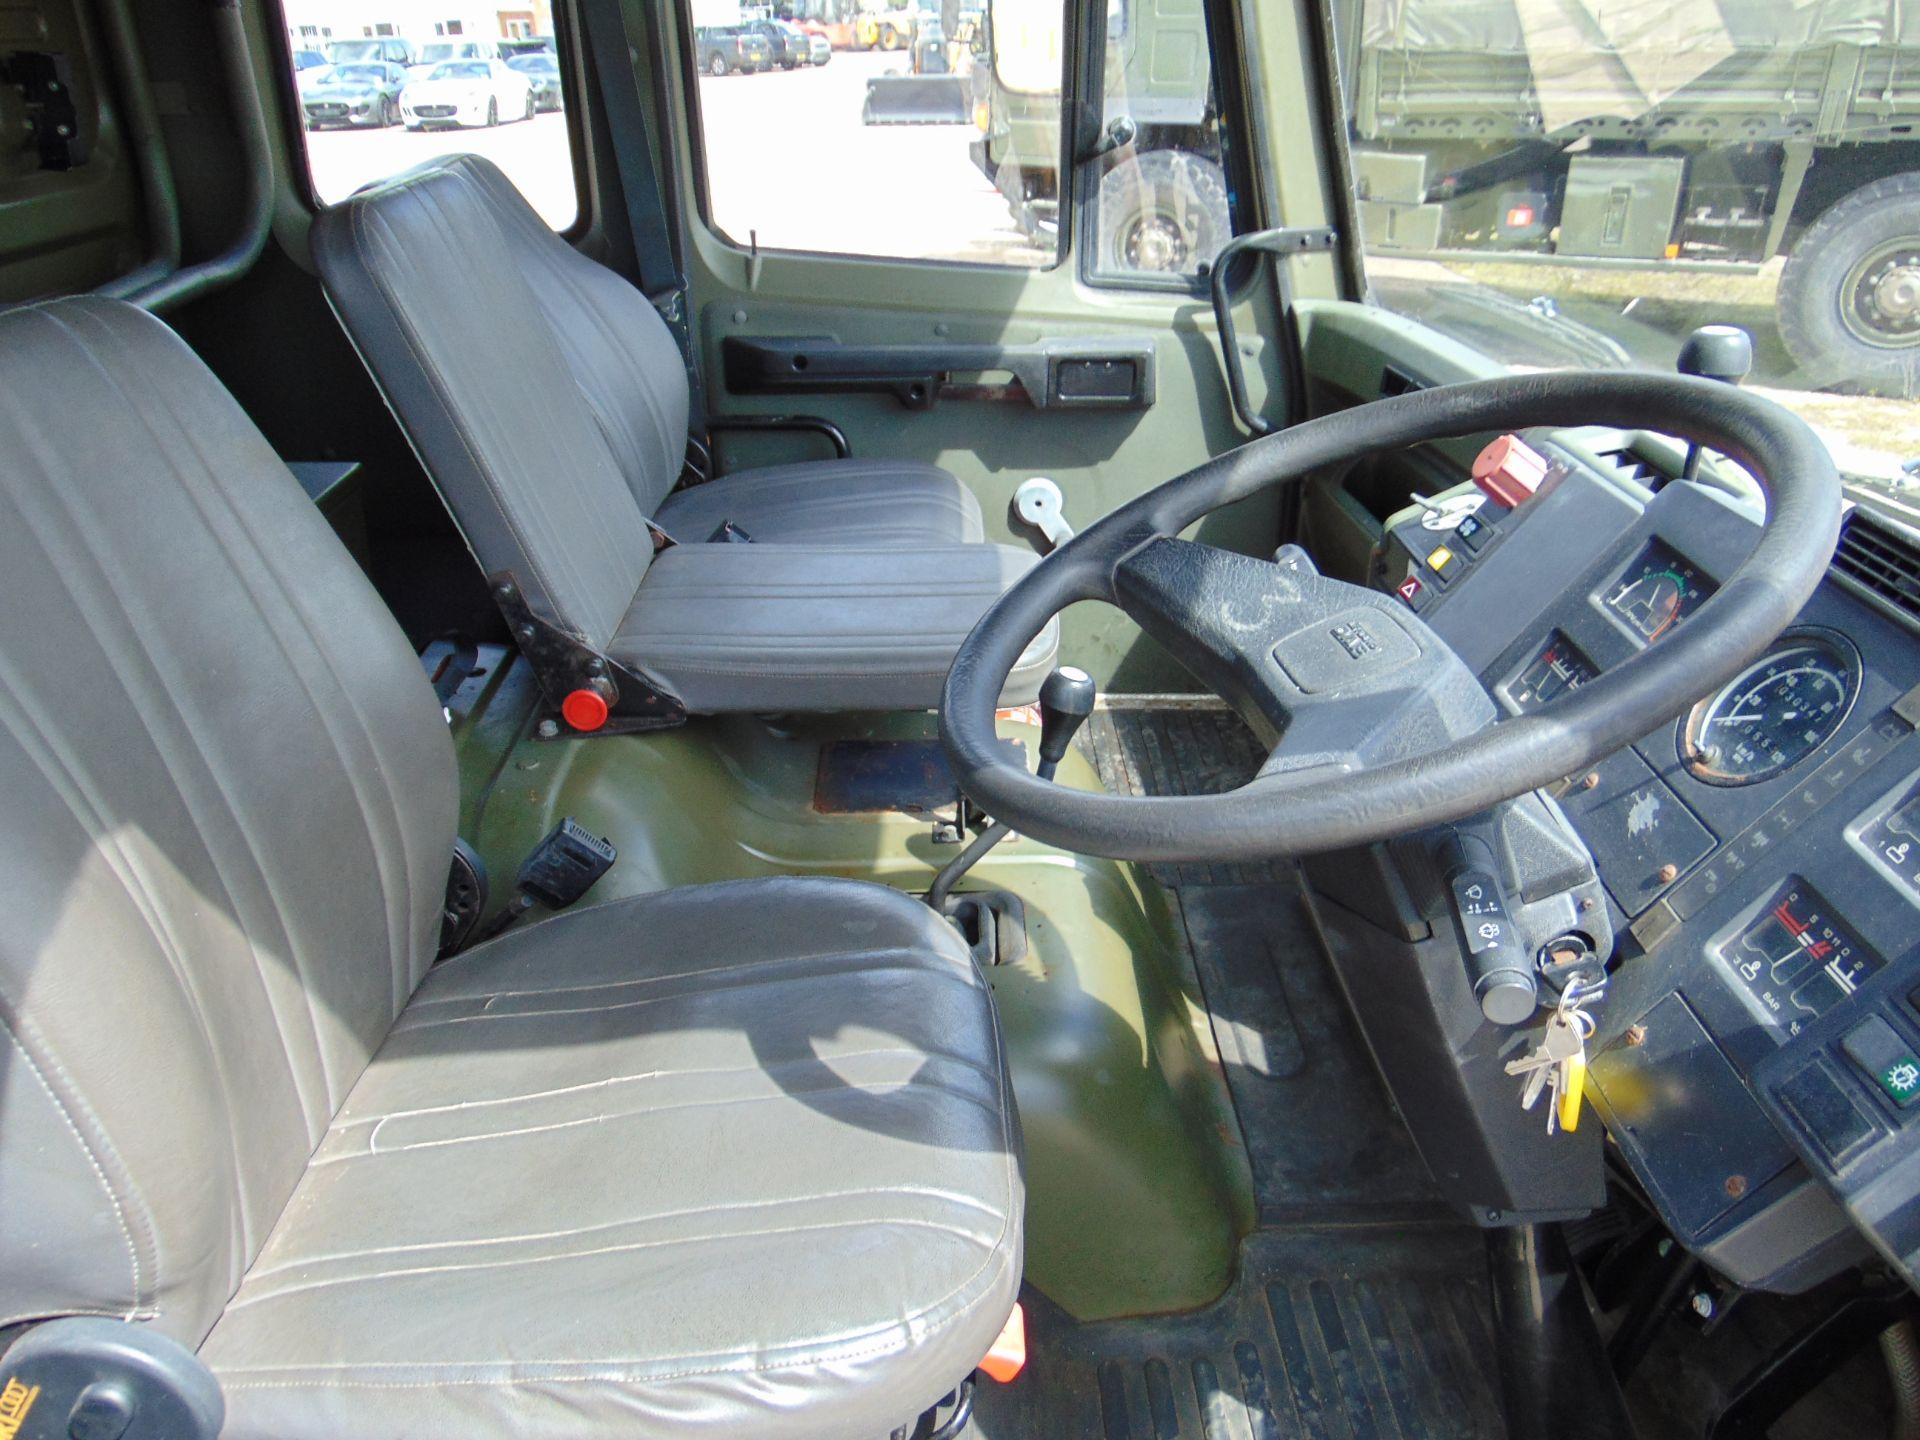 Leyland Daf 45/150 4 x 4 - Image 20 of 22